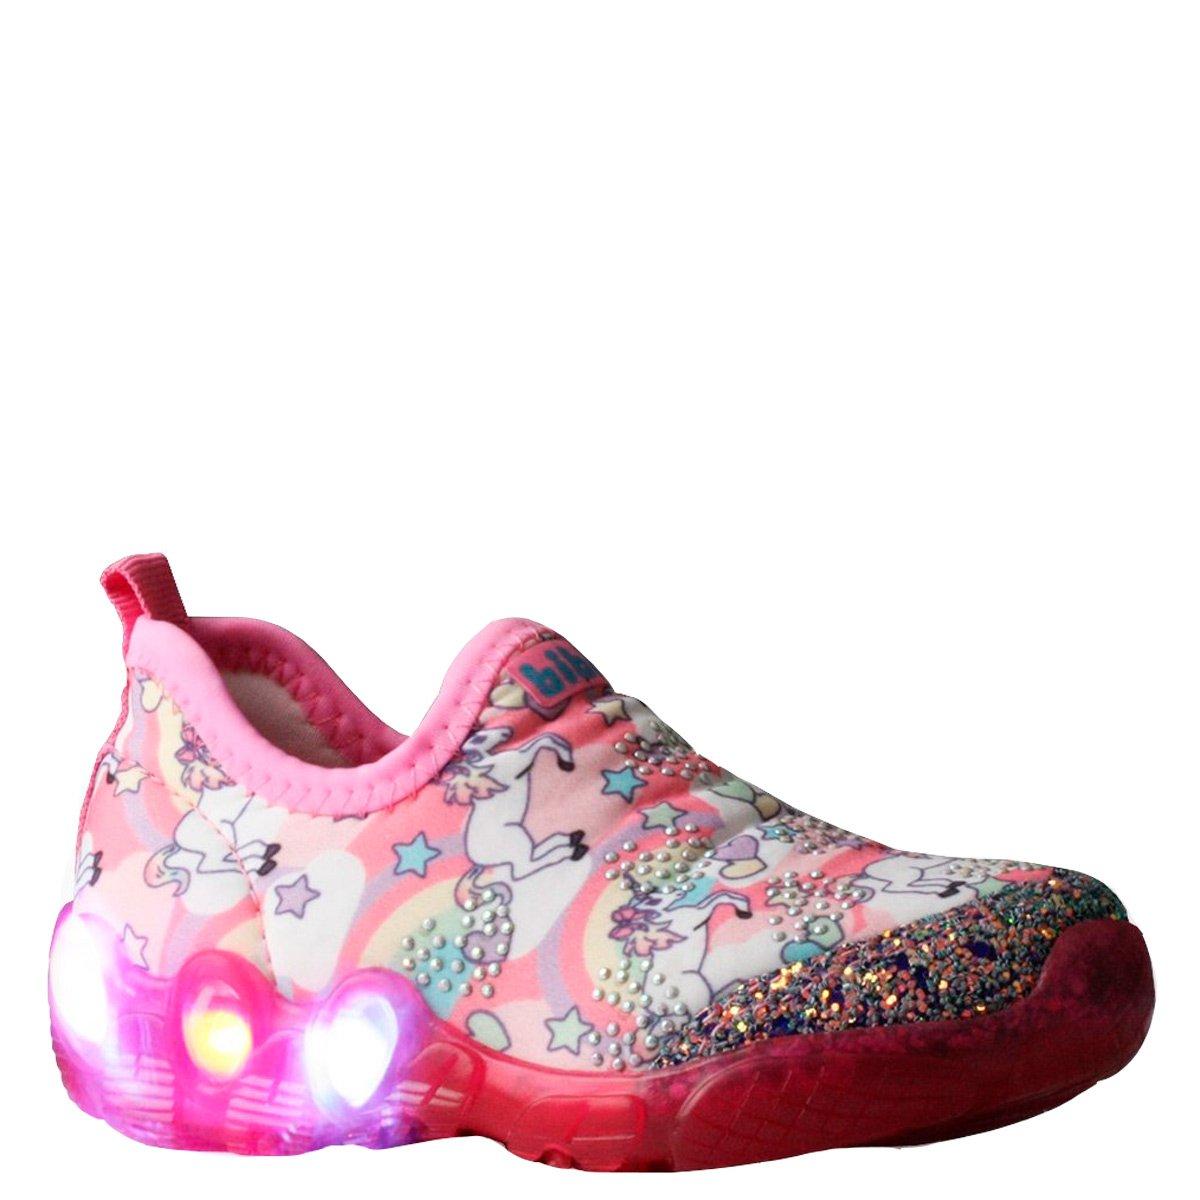 1ff7babd5 Bizz Store - Tênis Infantil Menina Bibi Space Wave Com Luzinhas